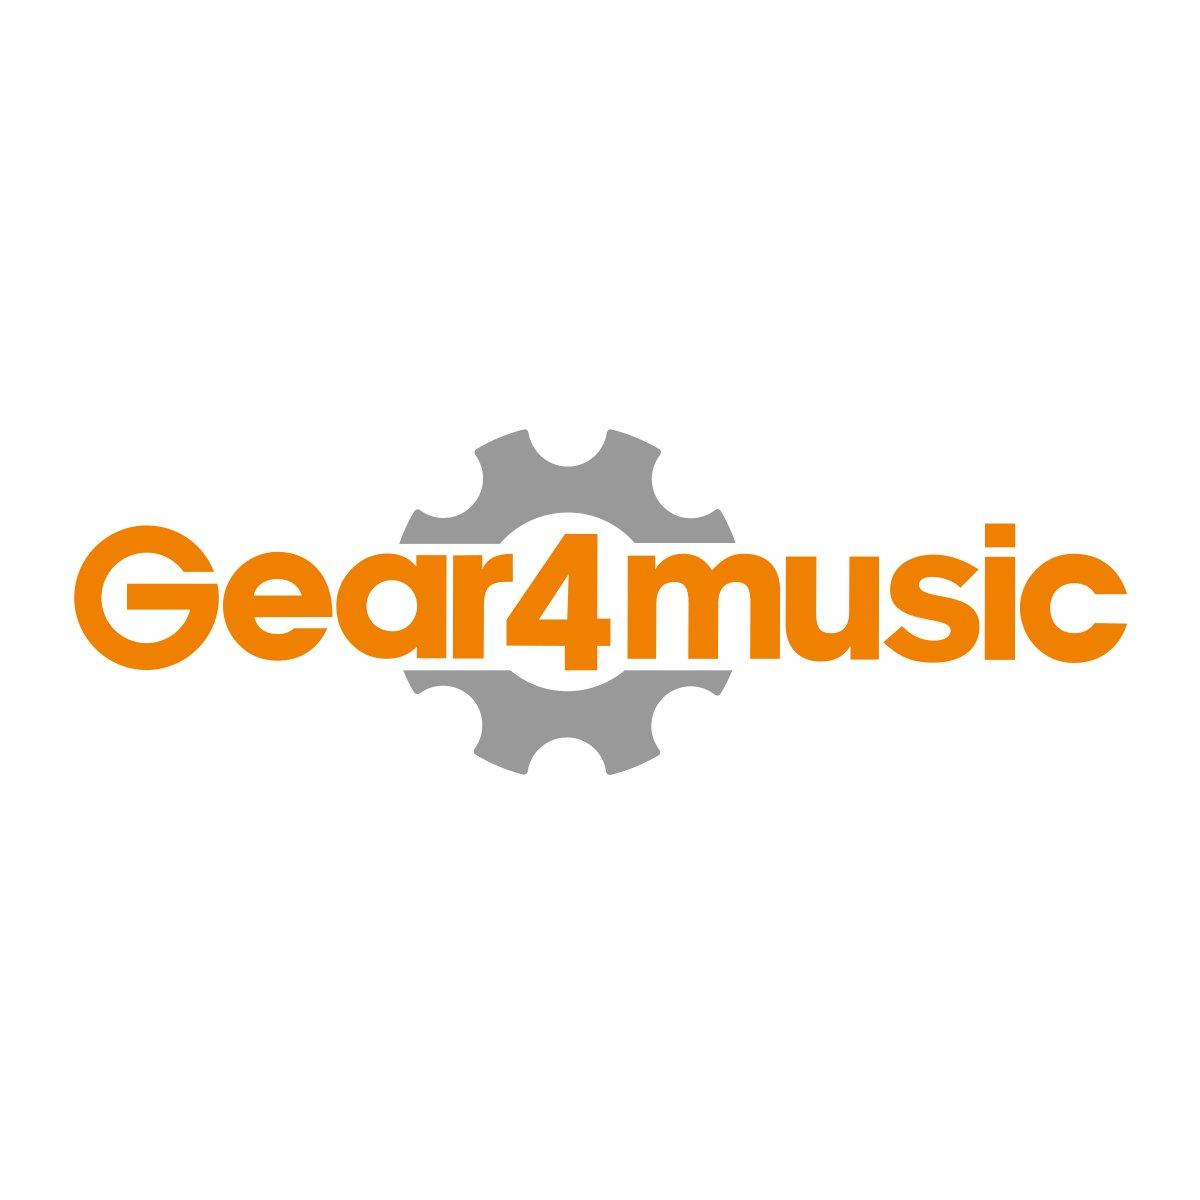 subzero wireless headset systems gear4music. Black Bedroom Furniture Sets. Home Design Ideas